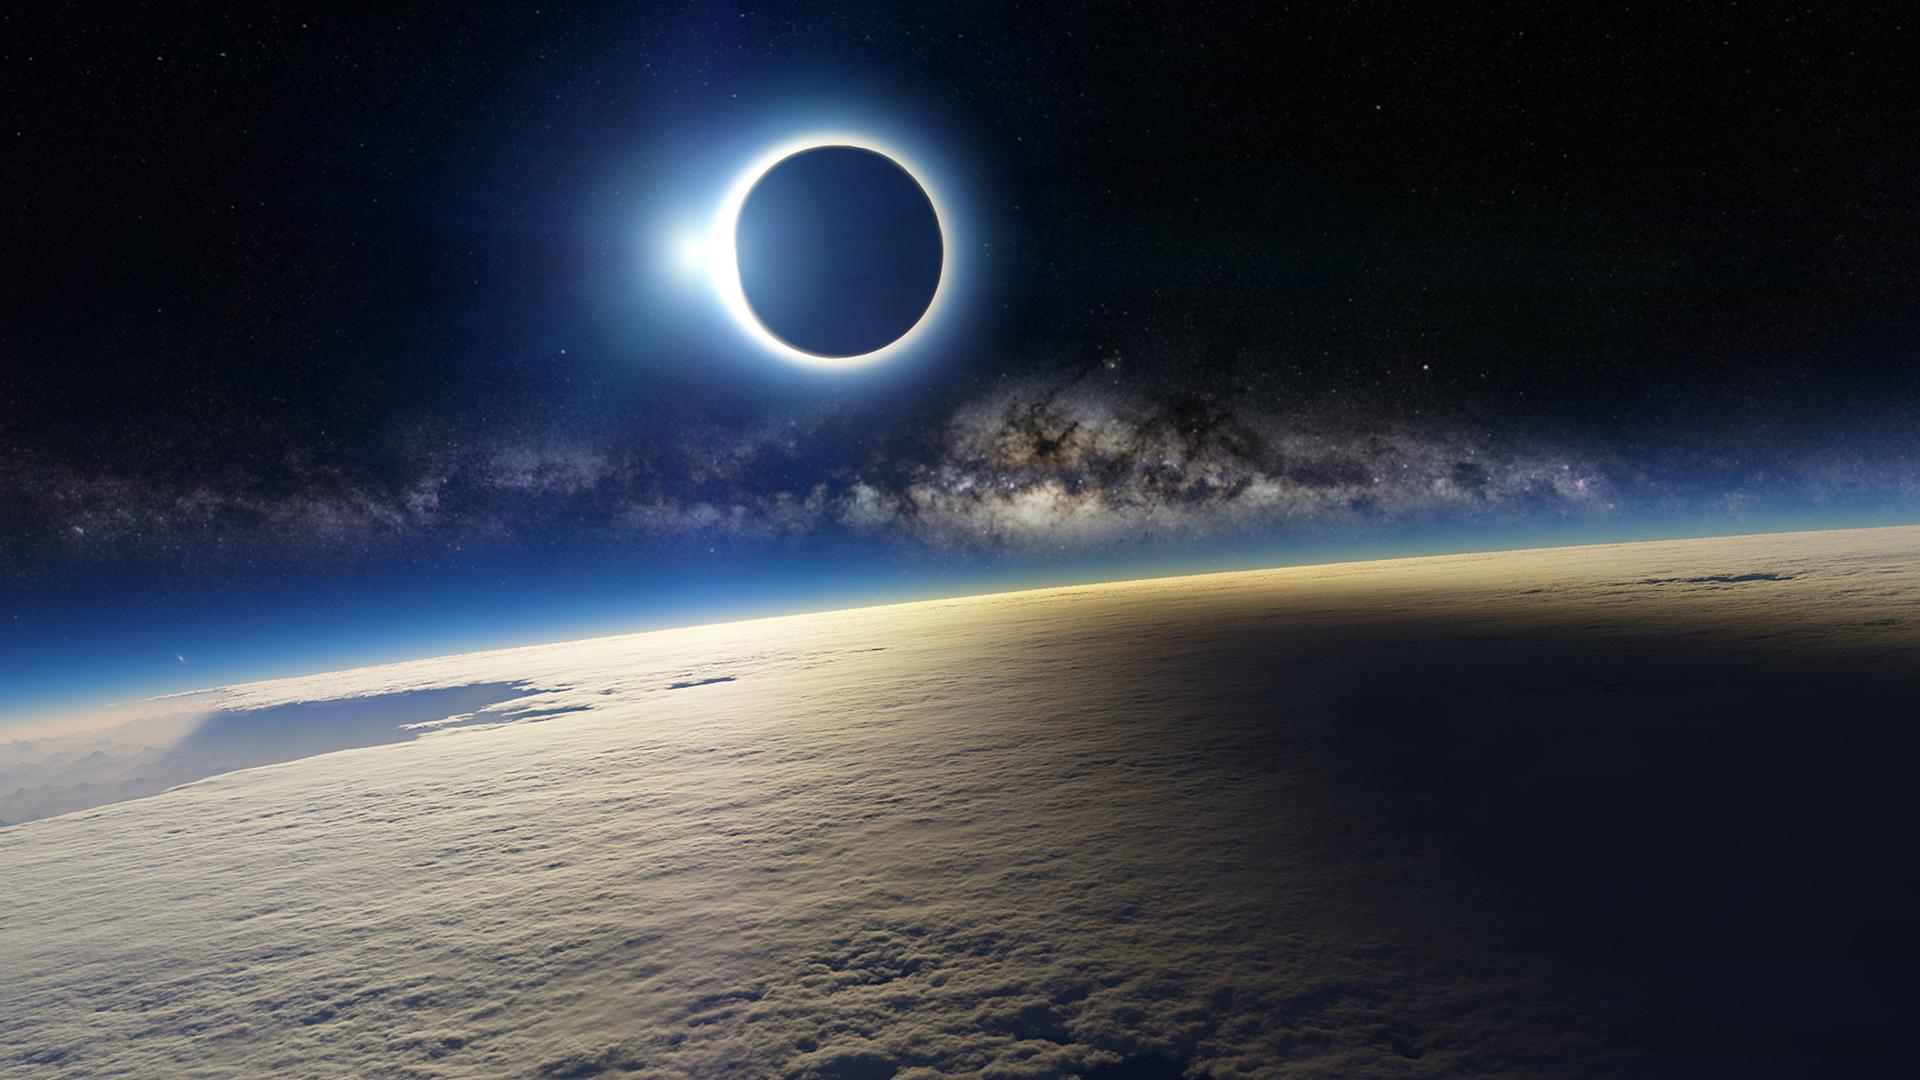 http://4.bp.blogspot.com/-yxRMhu45iA0/T70Y07ZpPVI/AAAAAAAARy0/Kx6WUVbLzuk/s1920/3D_space_eclipse-wallpaper1920x1080.jpg